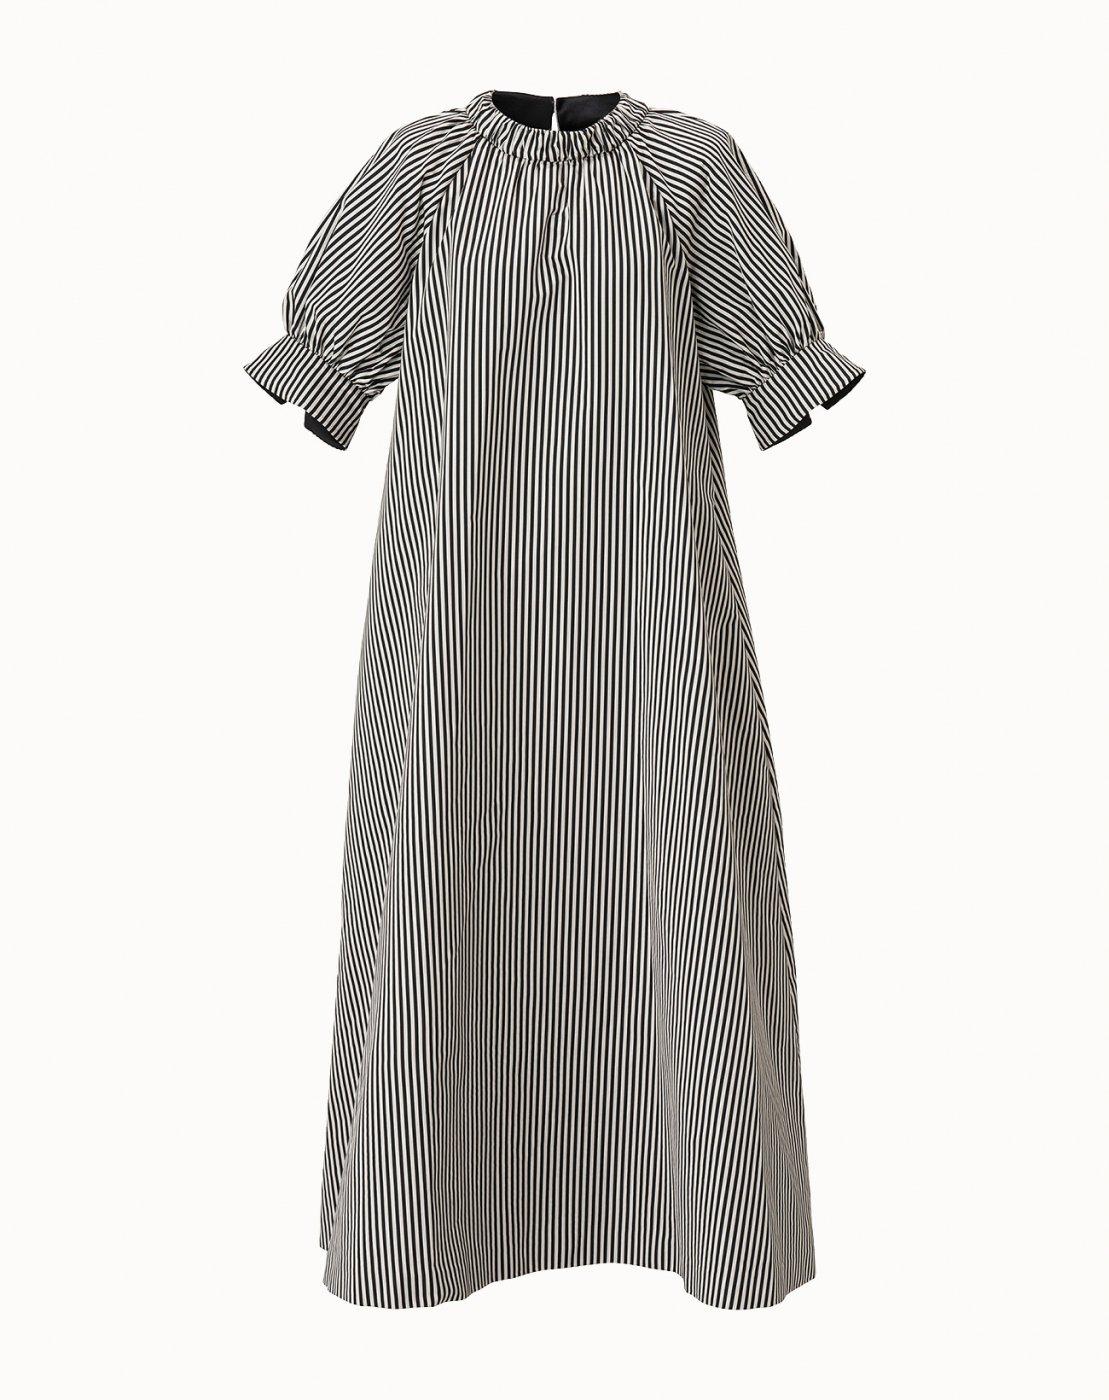 leur logette - Jacquard Dress  -Stripe